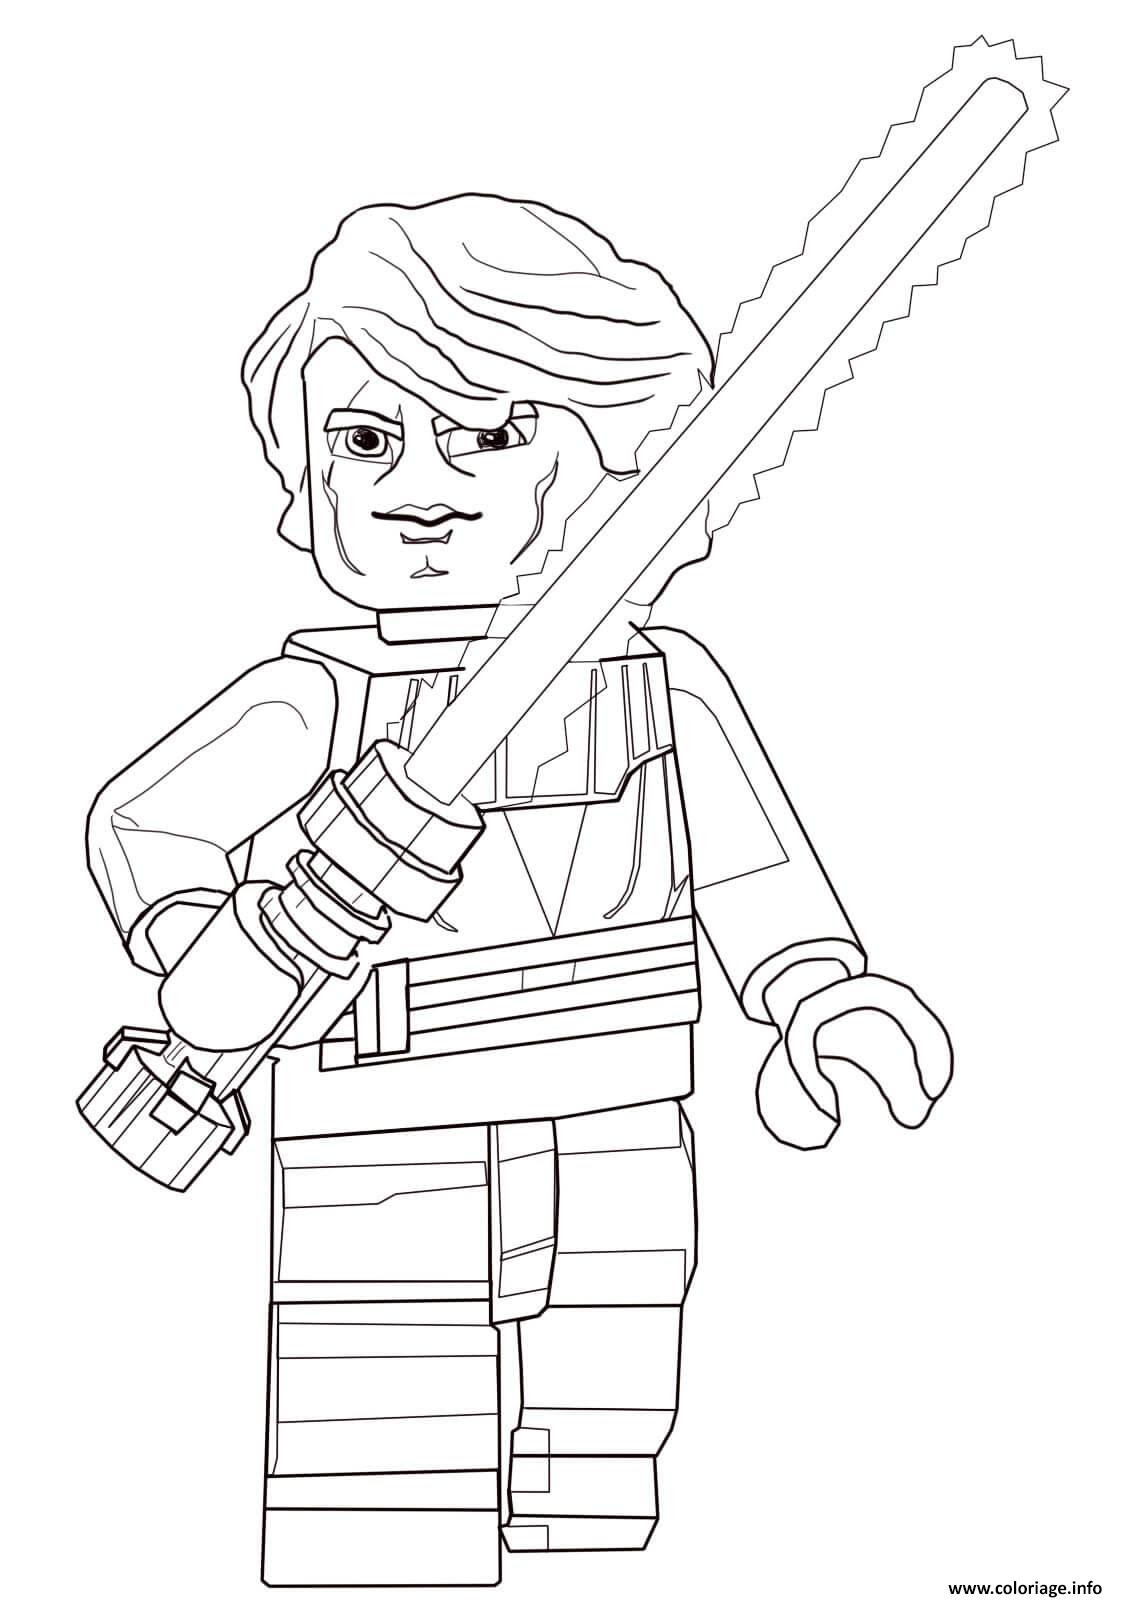 Coloriage Lego Star Wars 77 Dessin  Imprimer